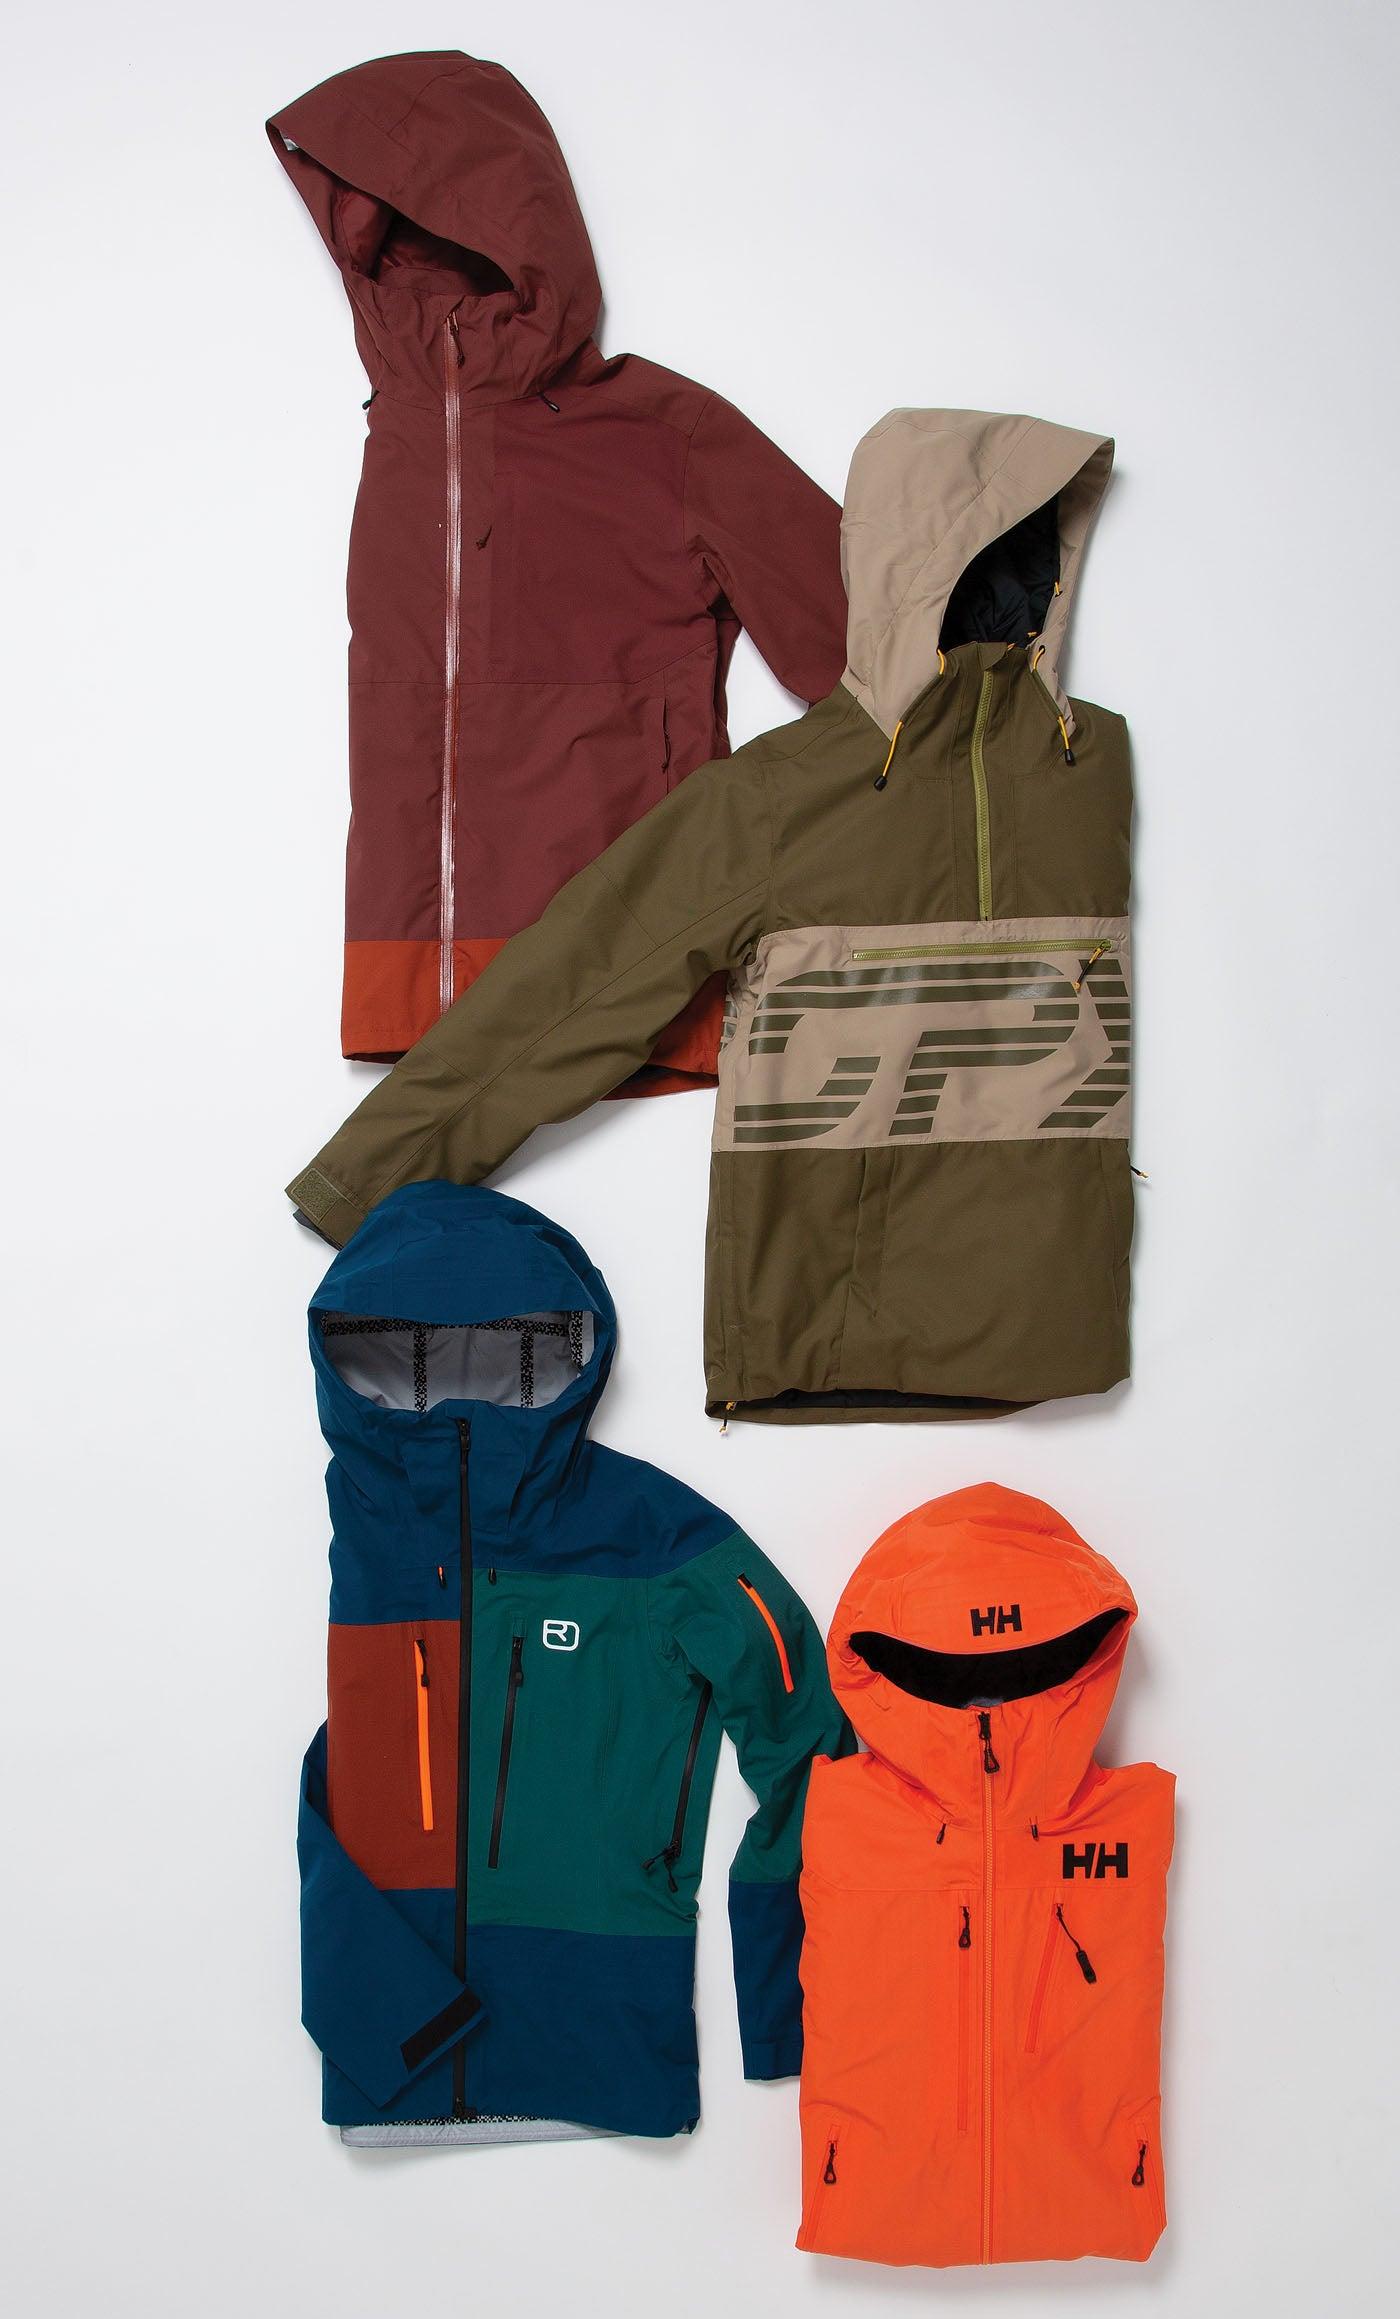 Men's Best Ski Jackets 2022